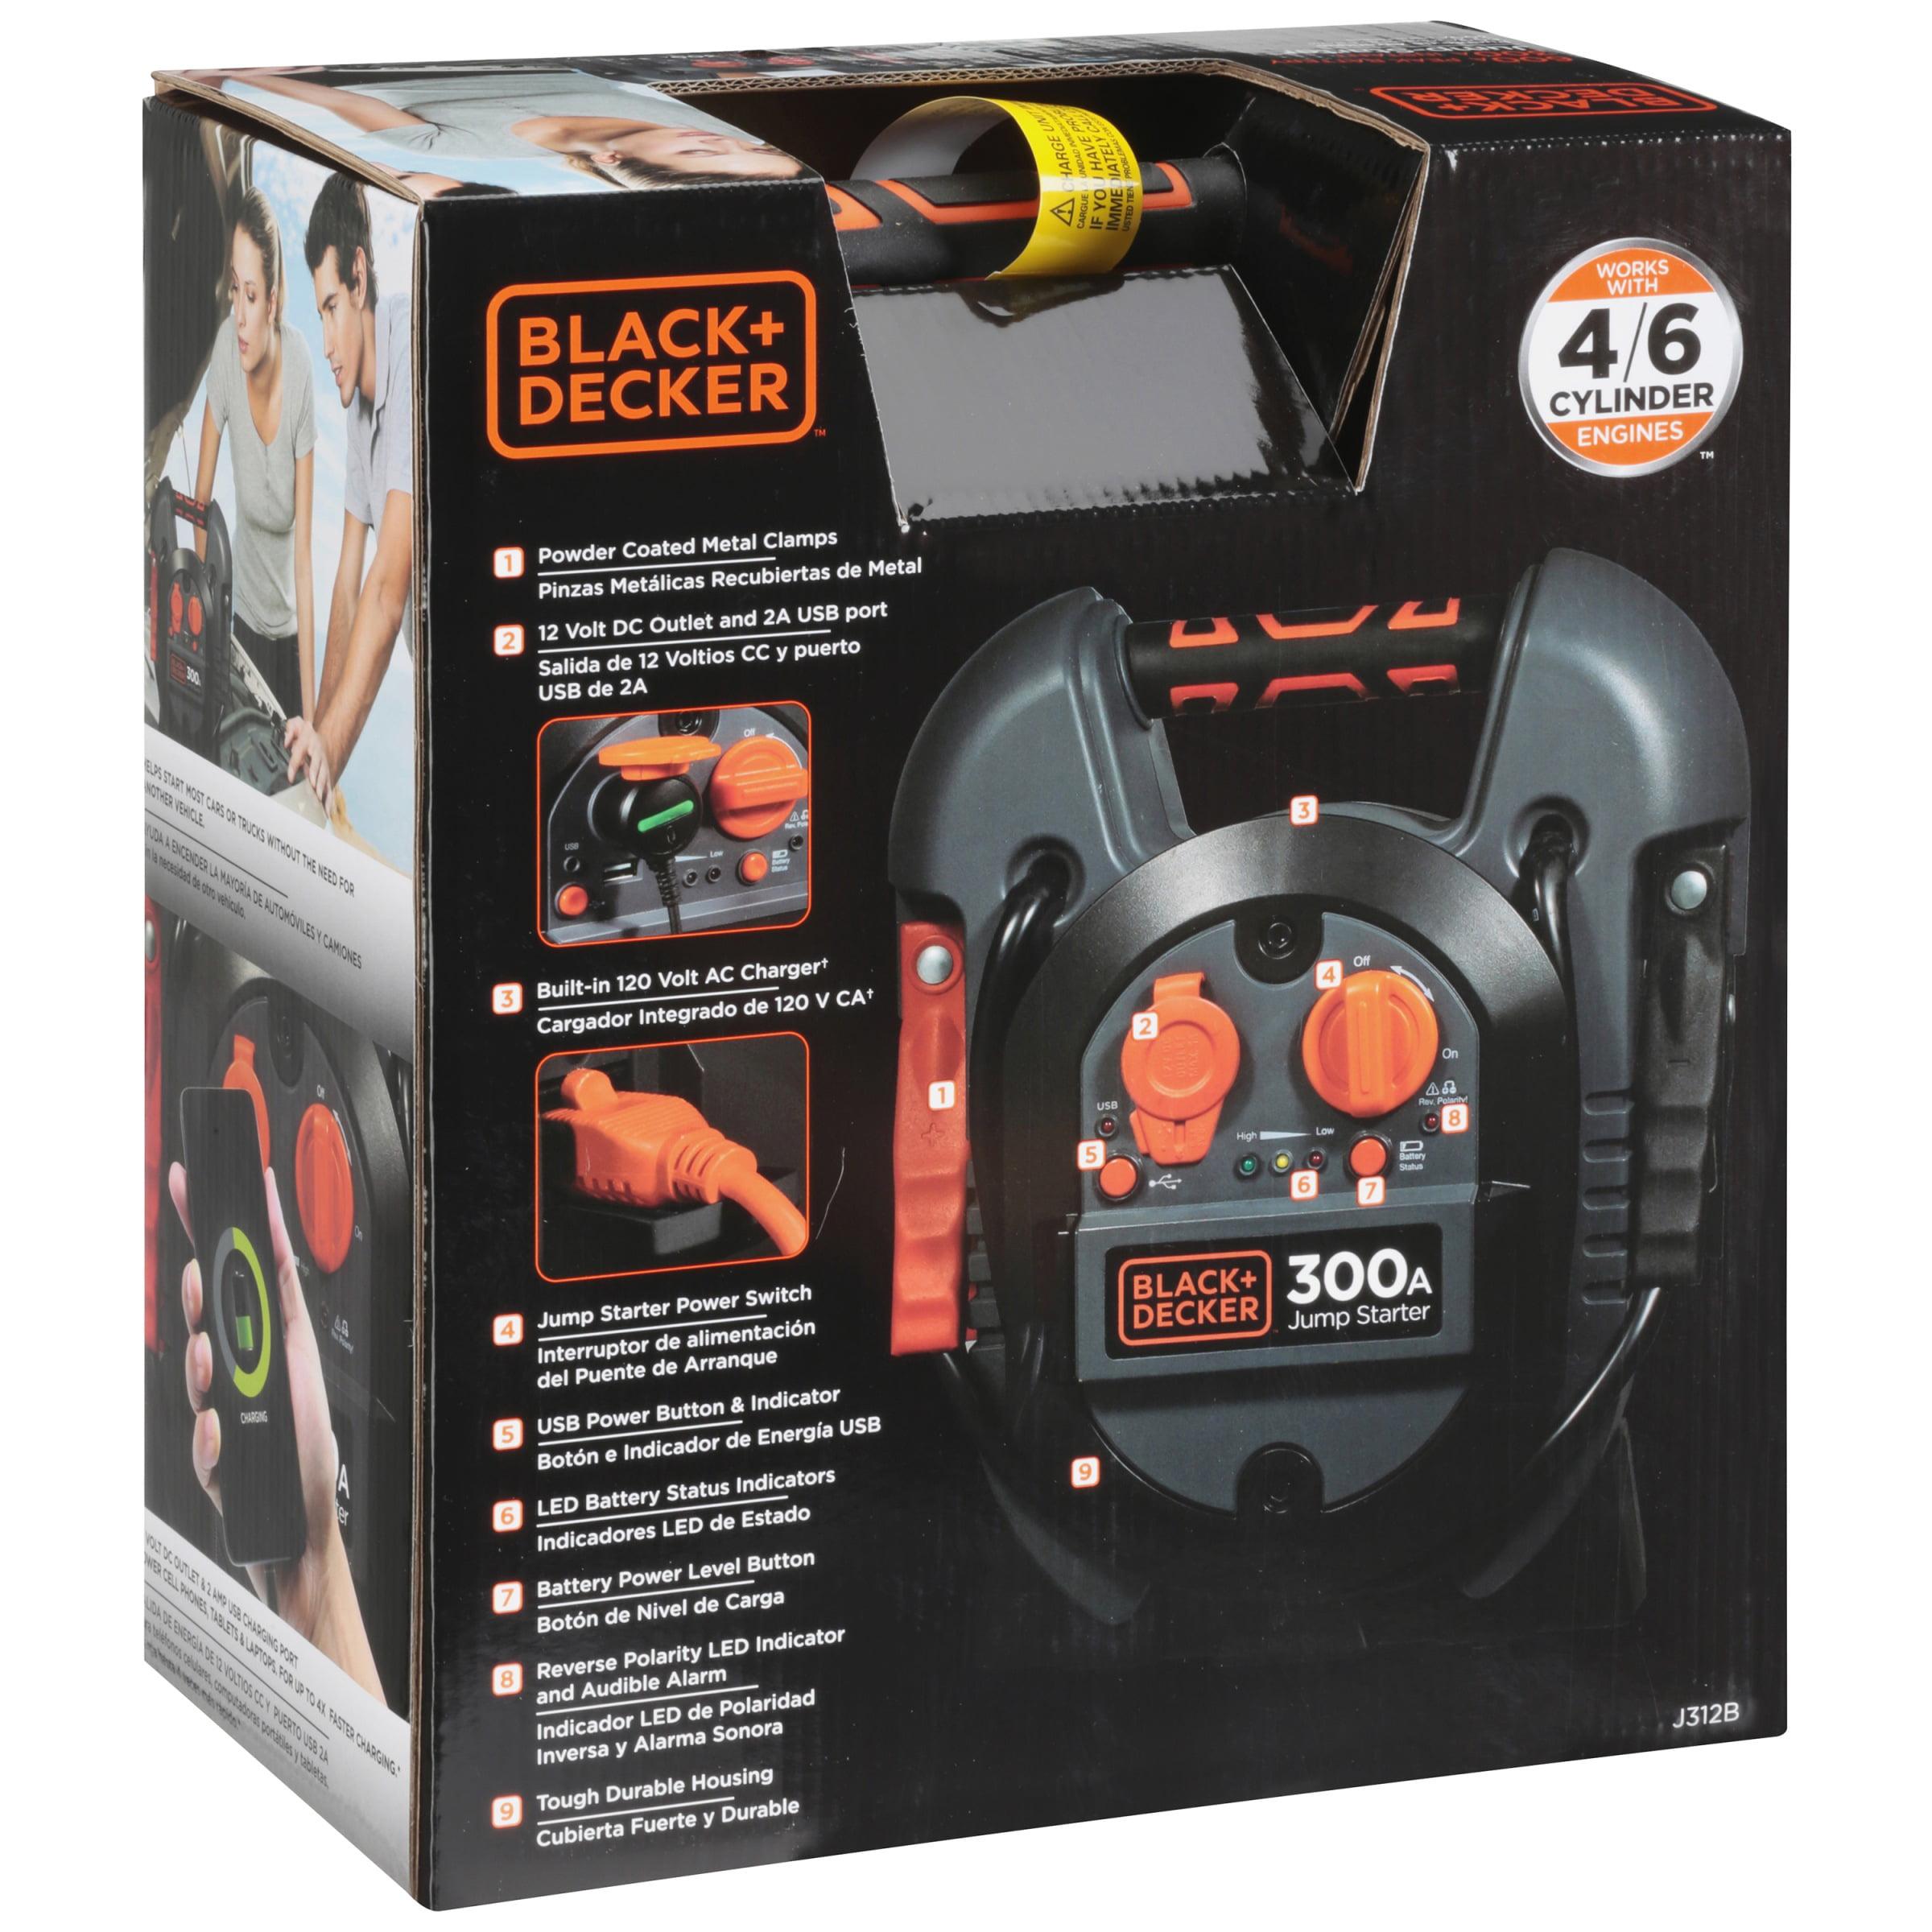 Black Decker 600a Peak Battery 300a Instant Jump Starter Box Black And Decker Nw7220b1 Hand Vacuum